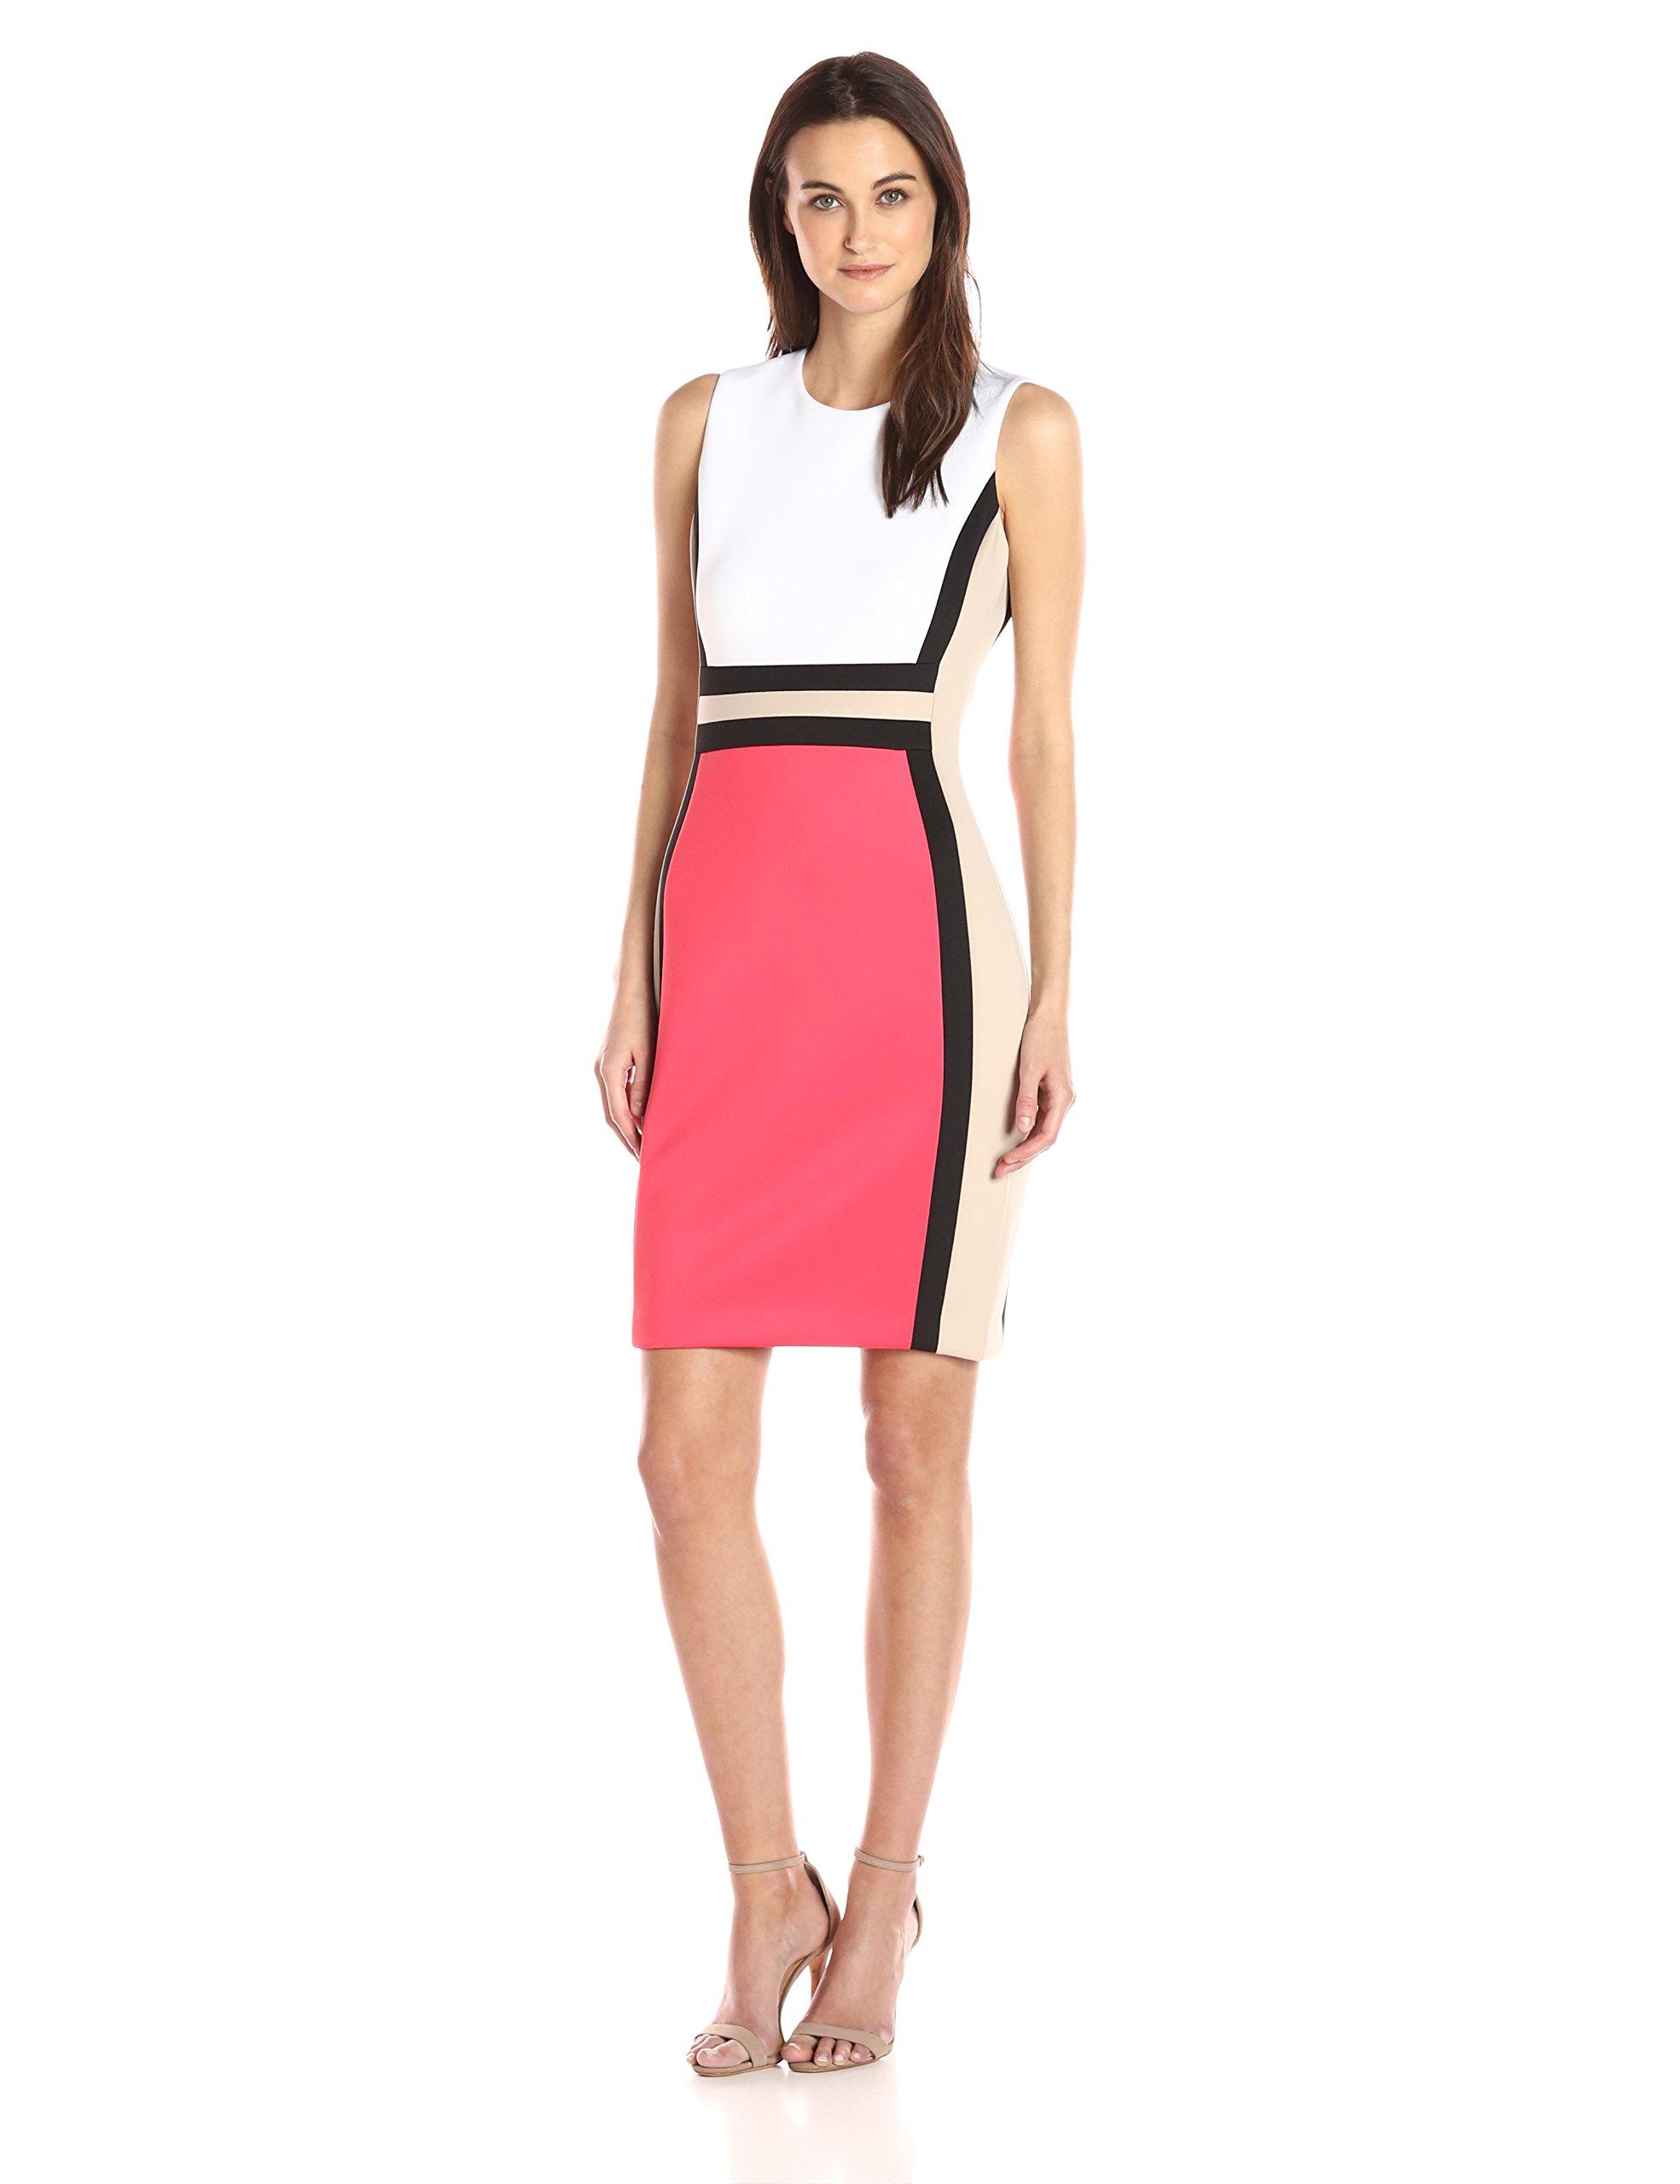 Calvin Klein Women's Sleeveless Color Block Sheath Dress, White/Waterrmelon Multi, 6